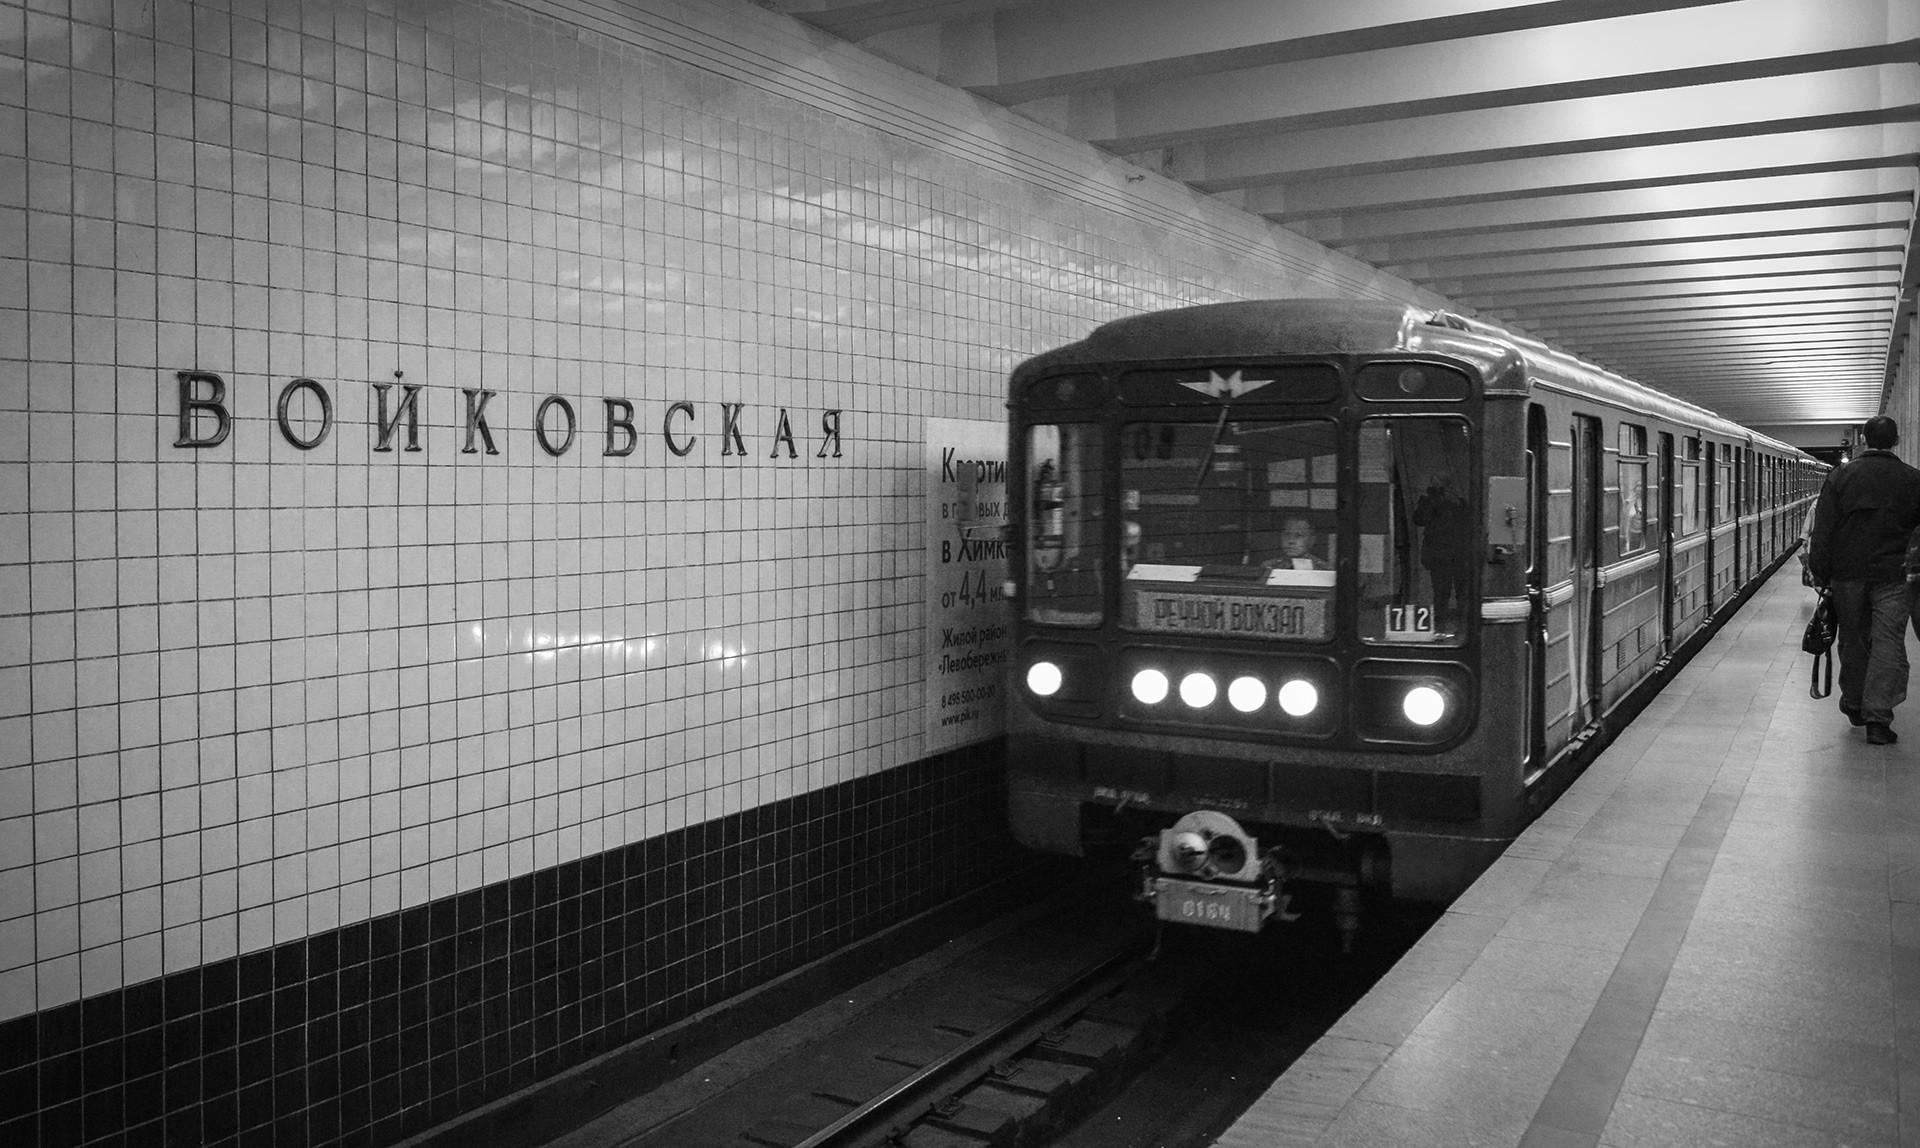 Station de métro Voïkovskaïa